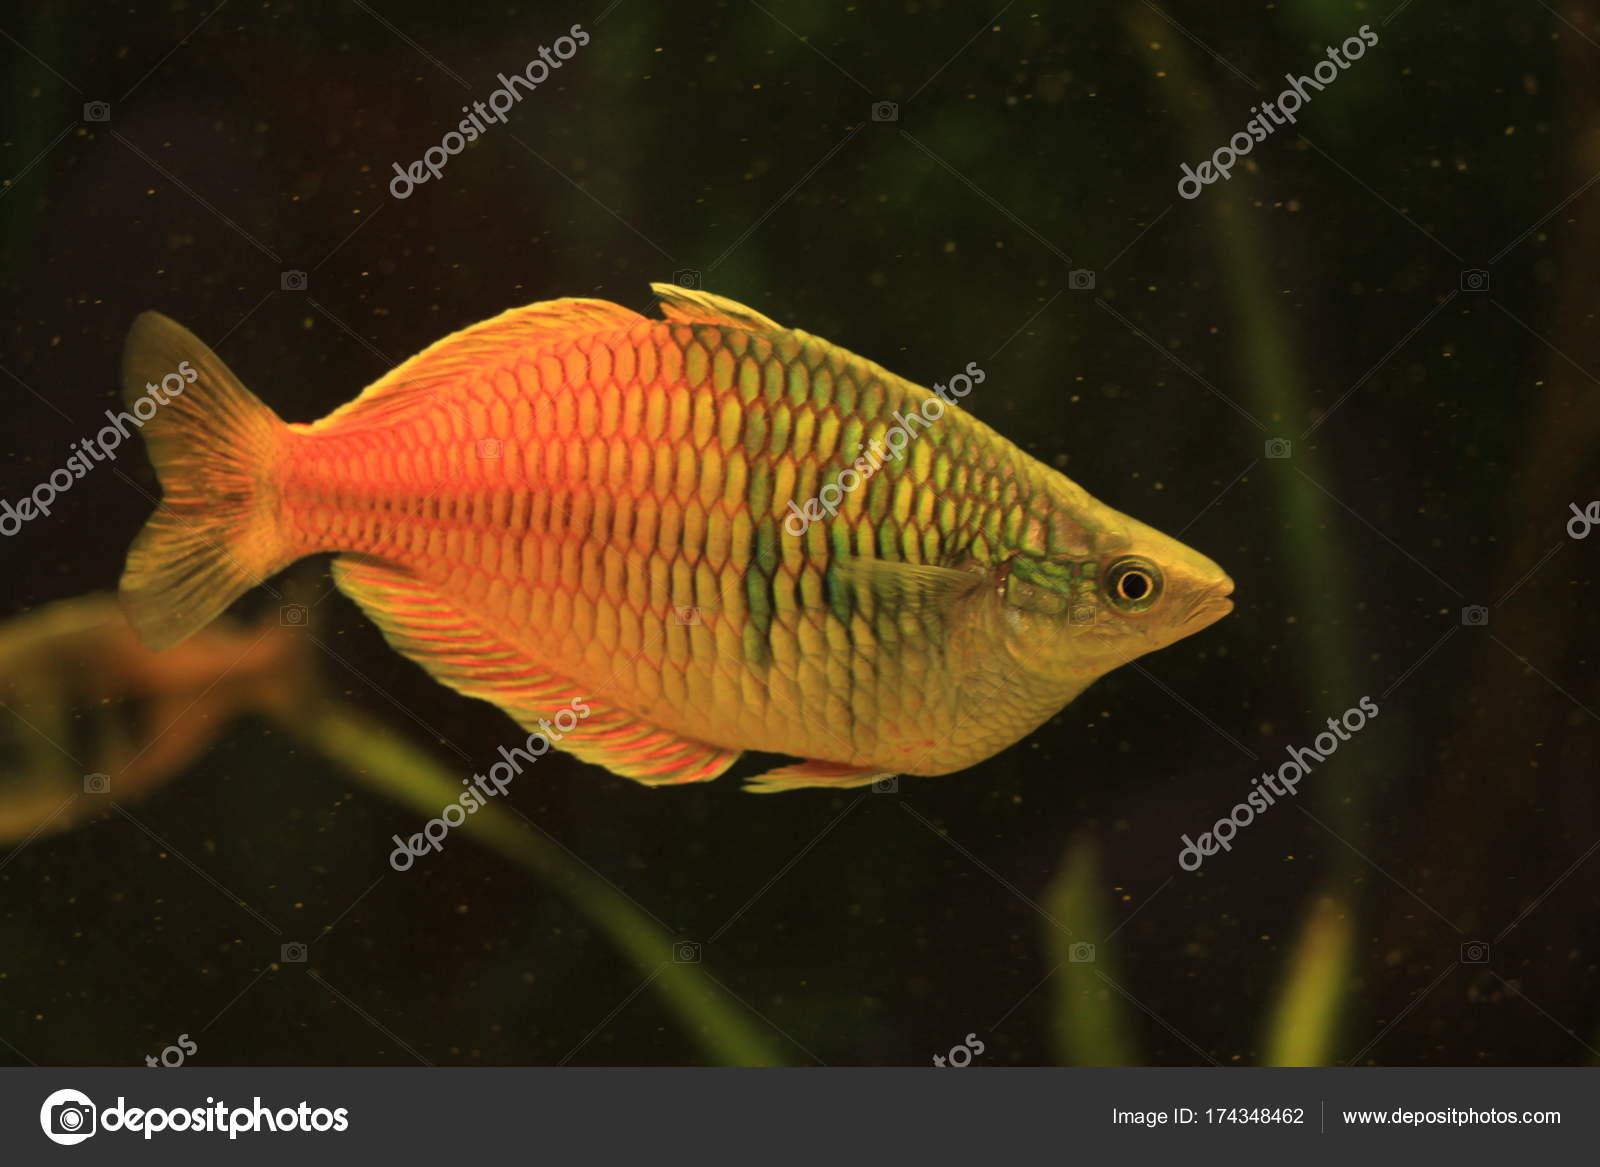 Honig Aquarium Fische & Aquarien